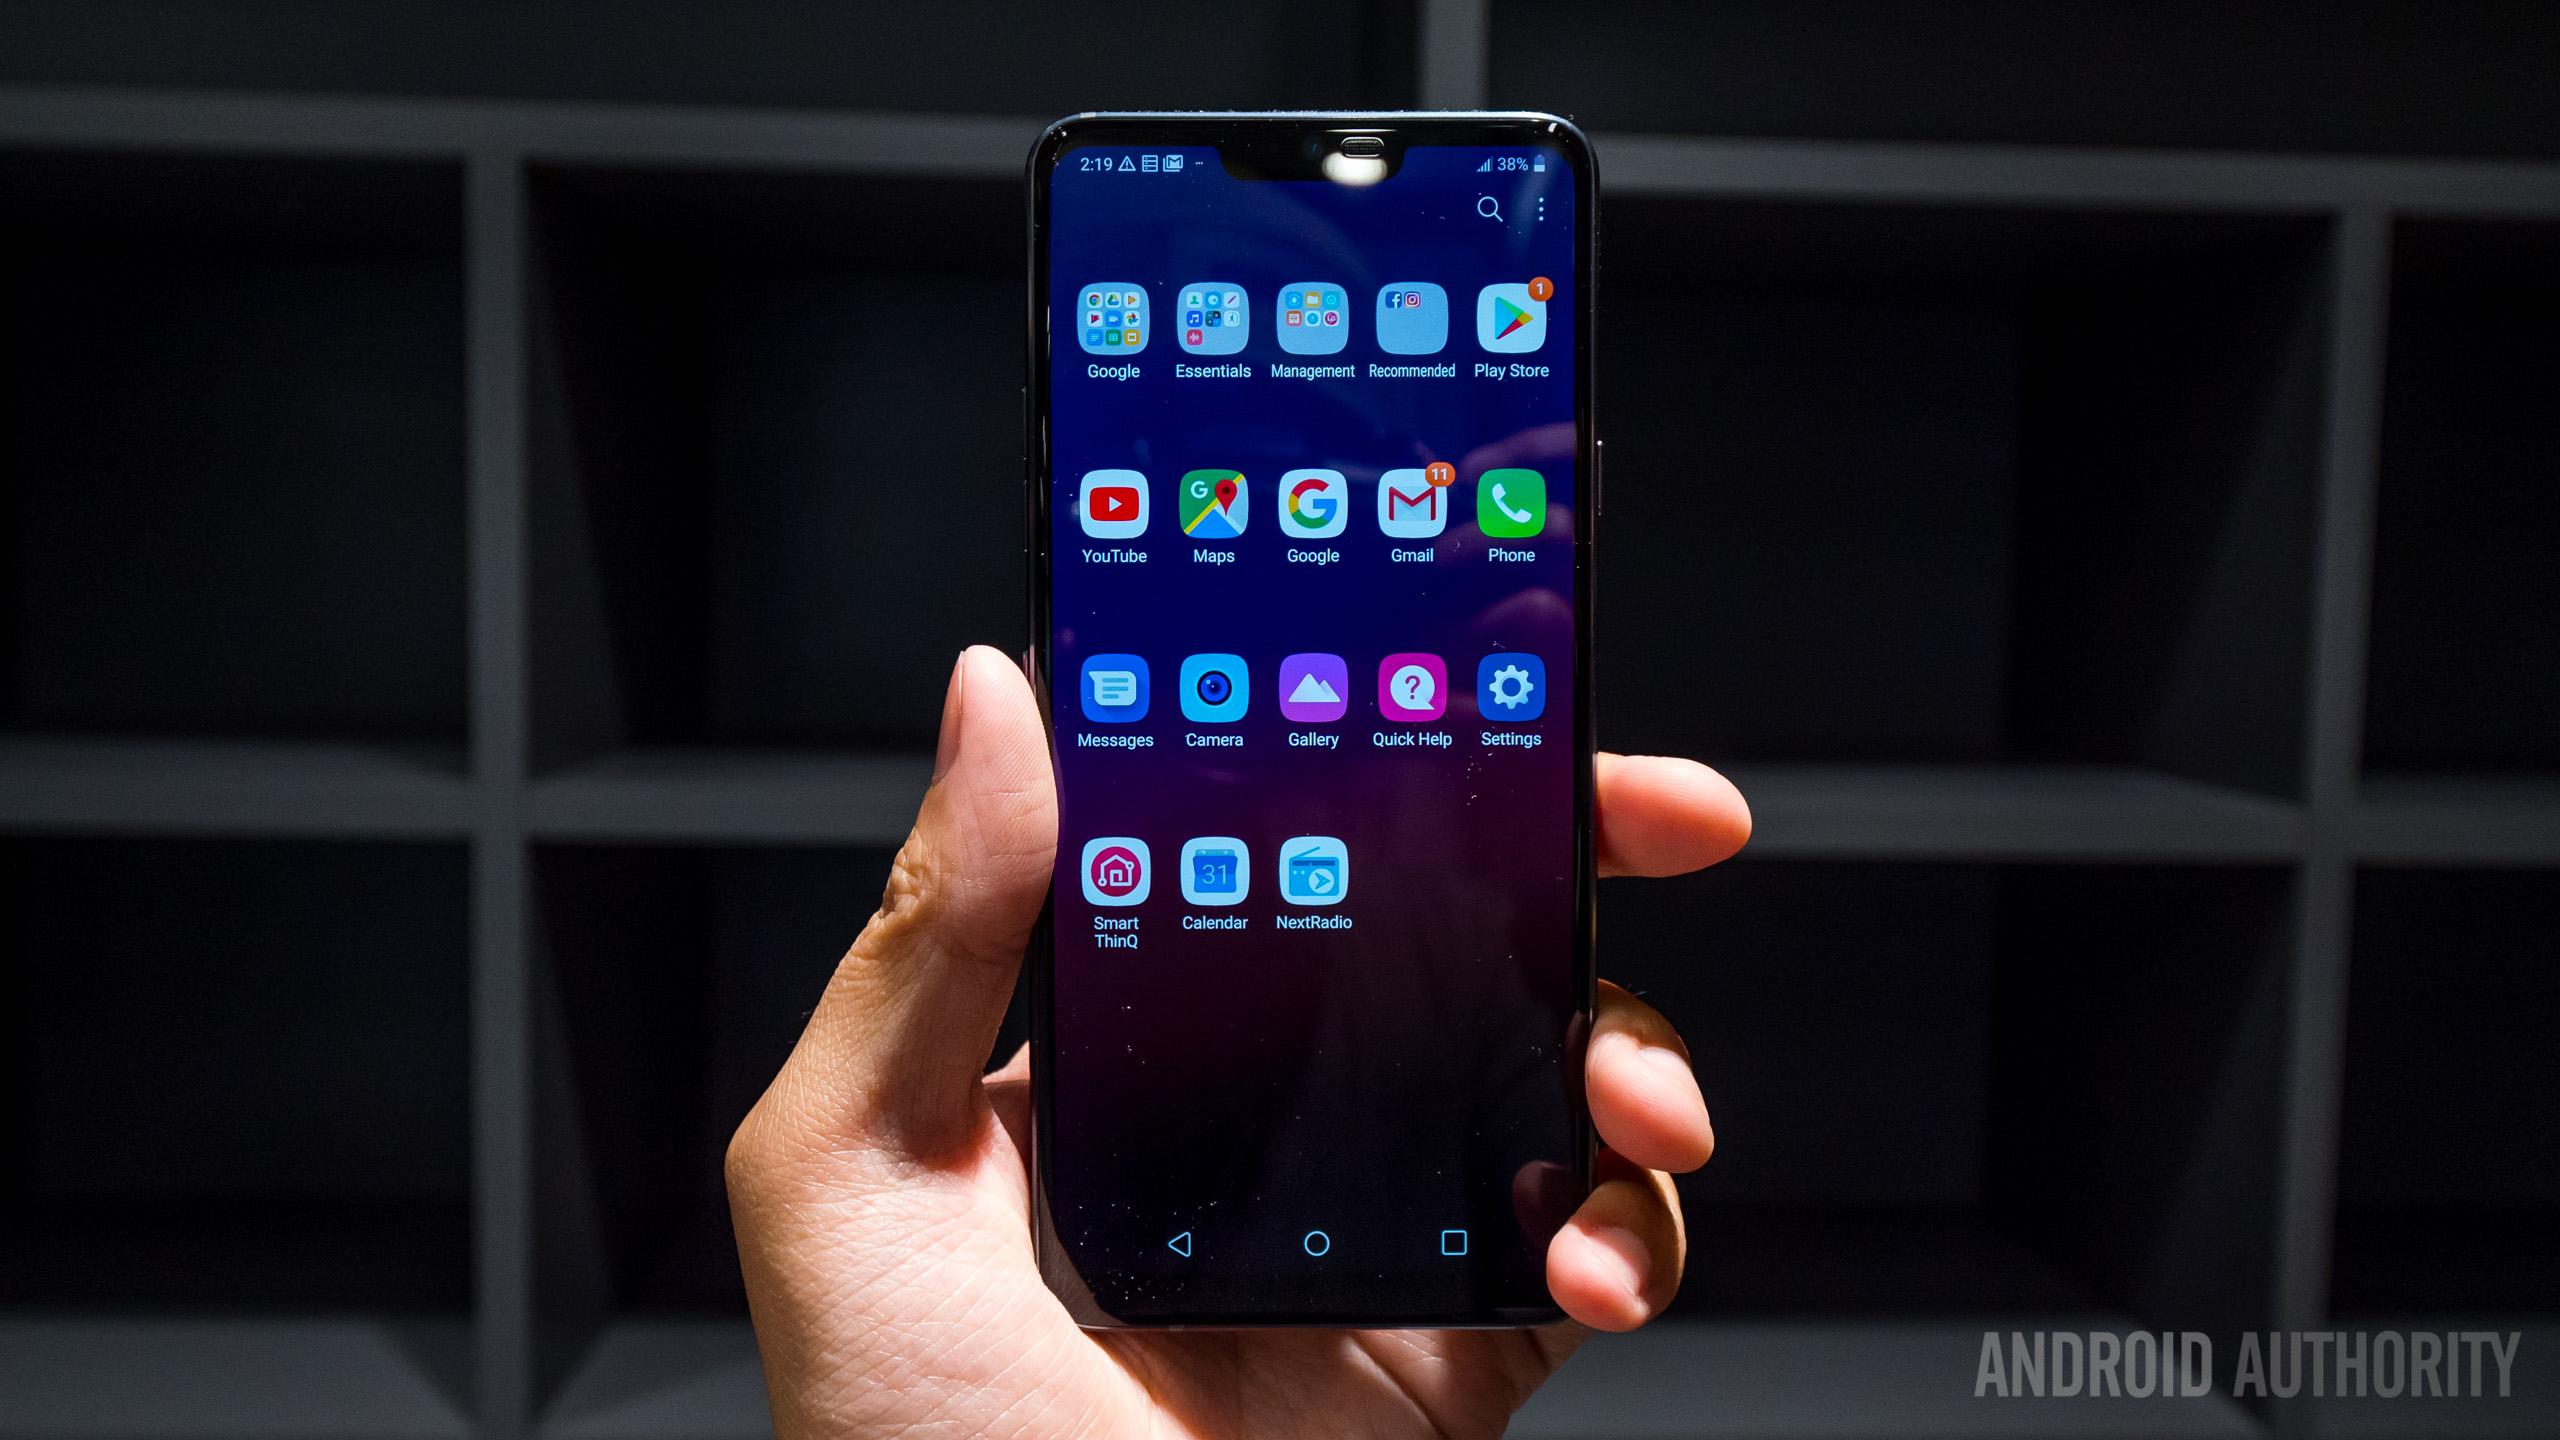 LG G7 ThinQ apps